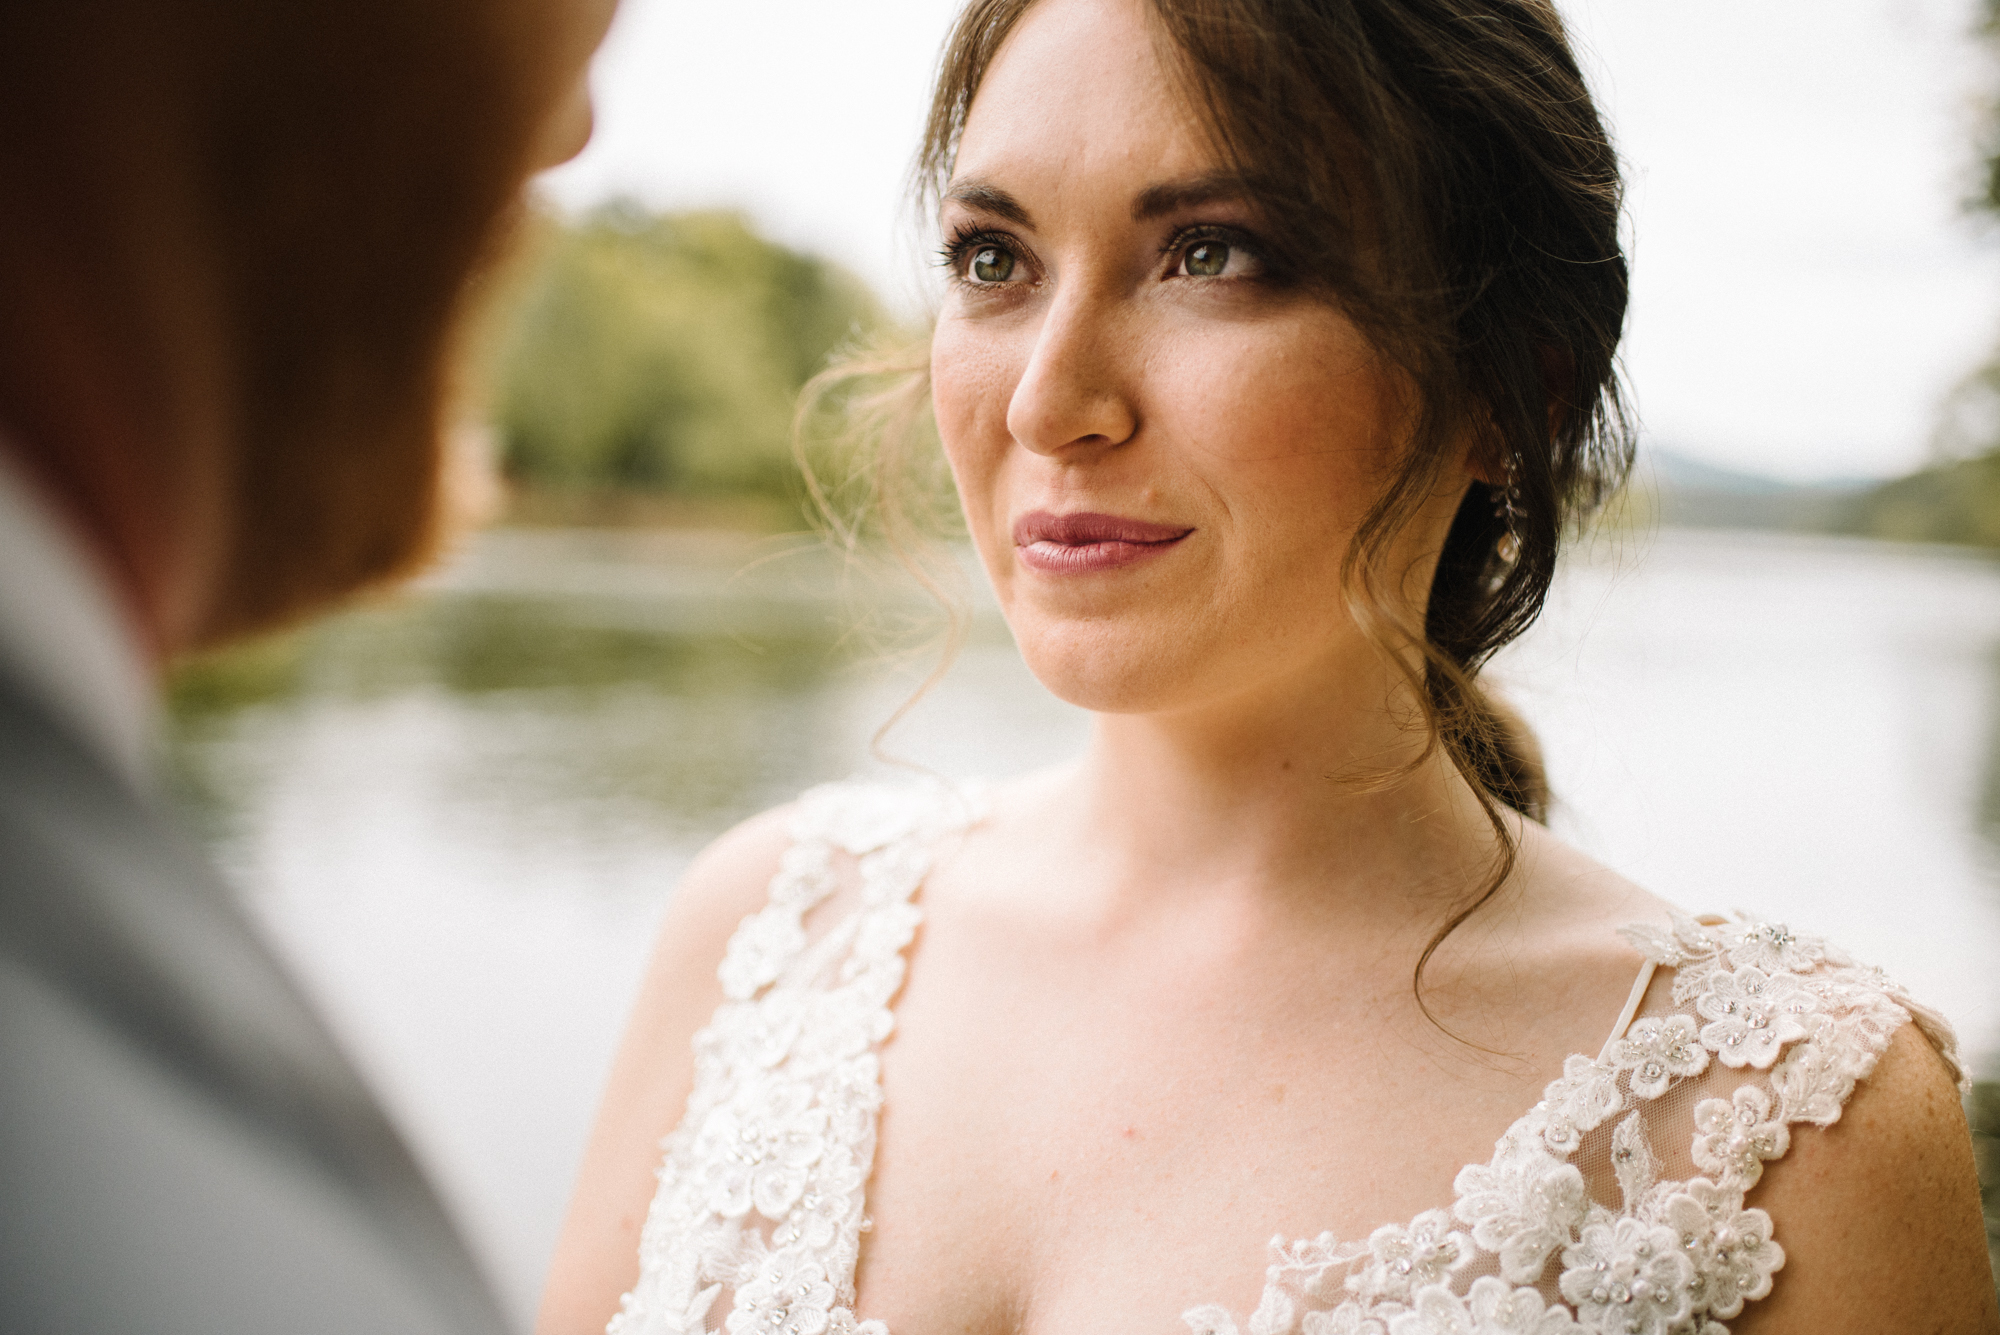 Mandi-and-Jordan-Intimate-Backyard-River-Wedding-Shenandoah-Valley_47.JPG